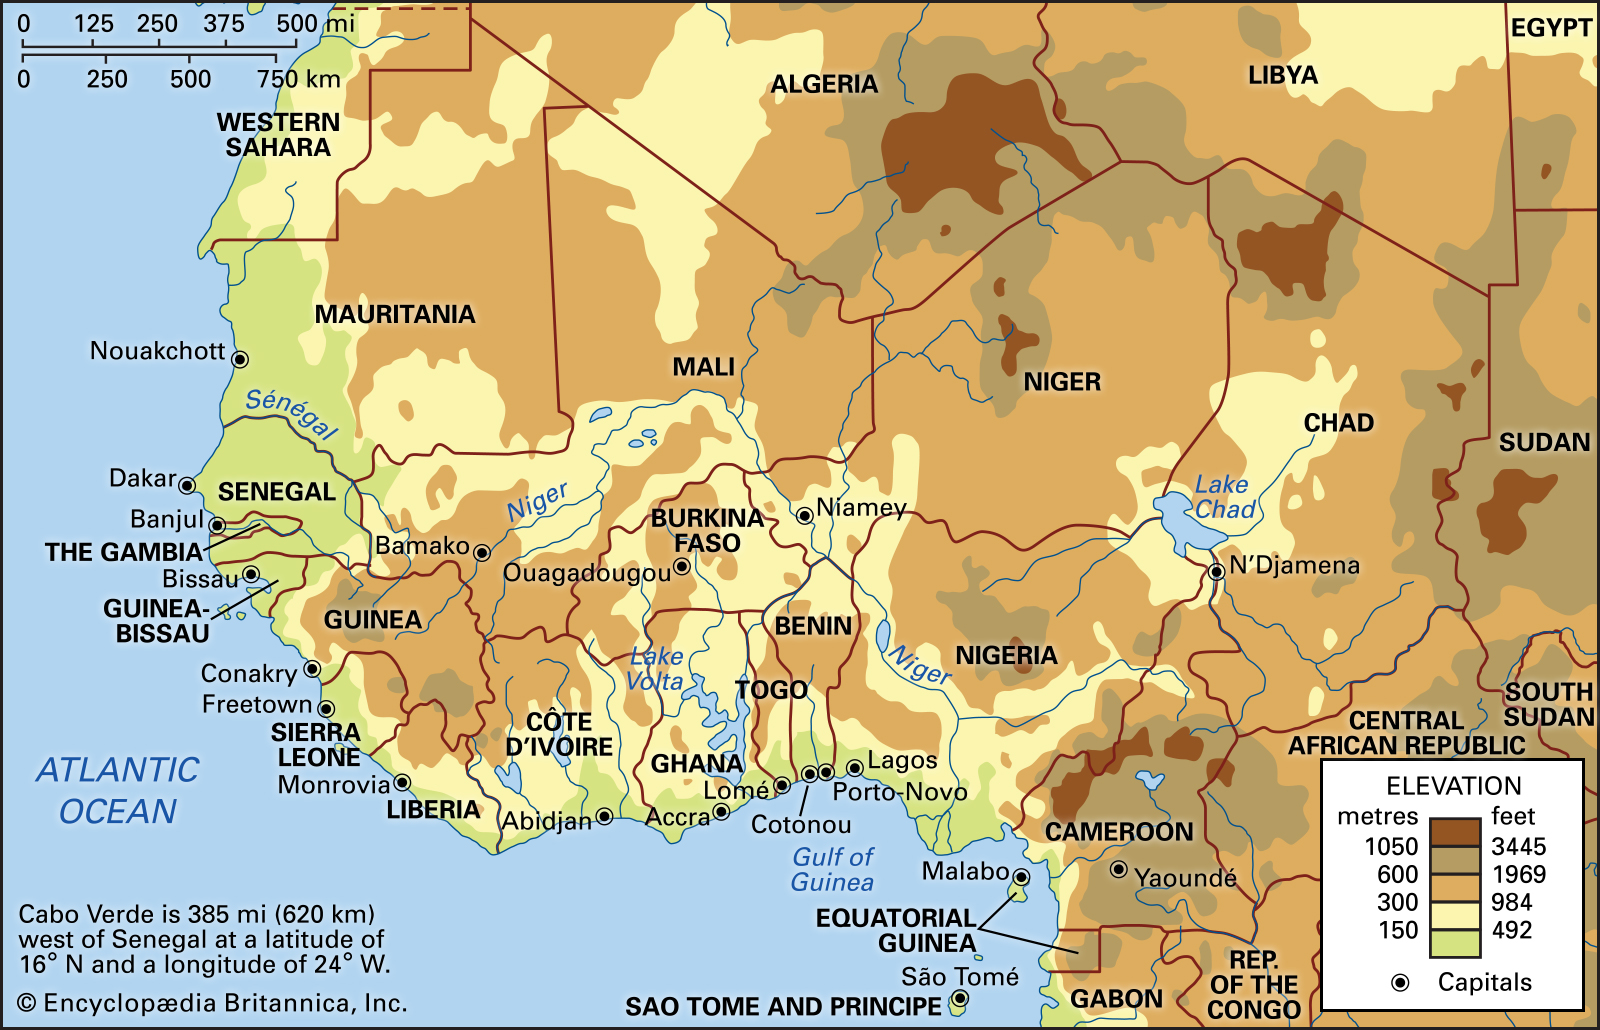 Niger Basin Authority Recruitment 2021/2022 Application Update Portal